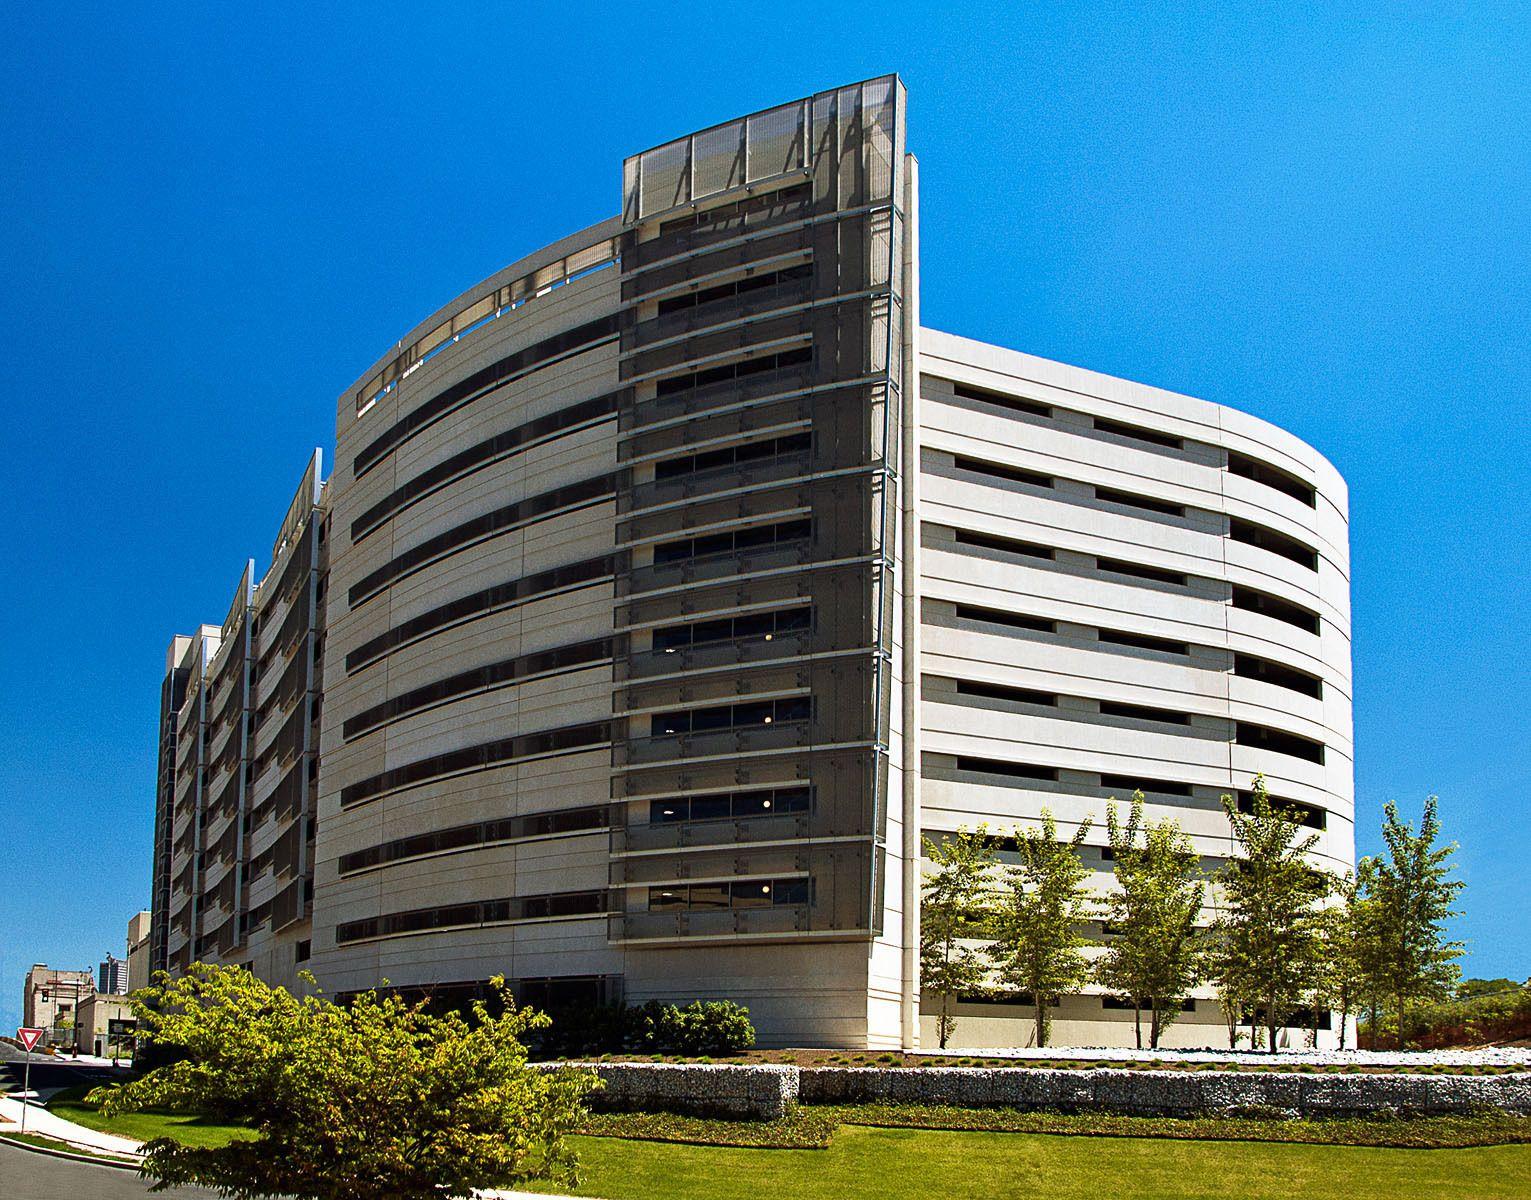 Health Sciences Parking Garage, Univ. of Pennsylvania, Philadelphia, PA